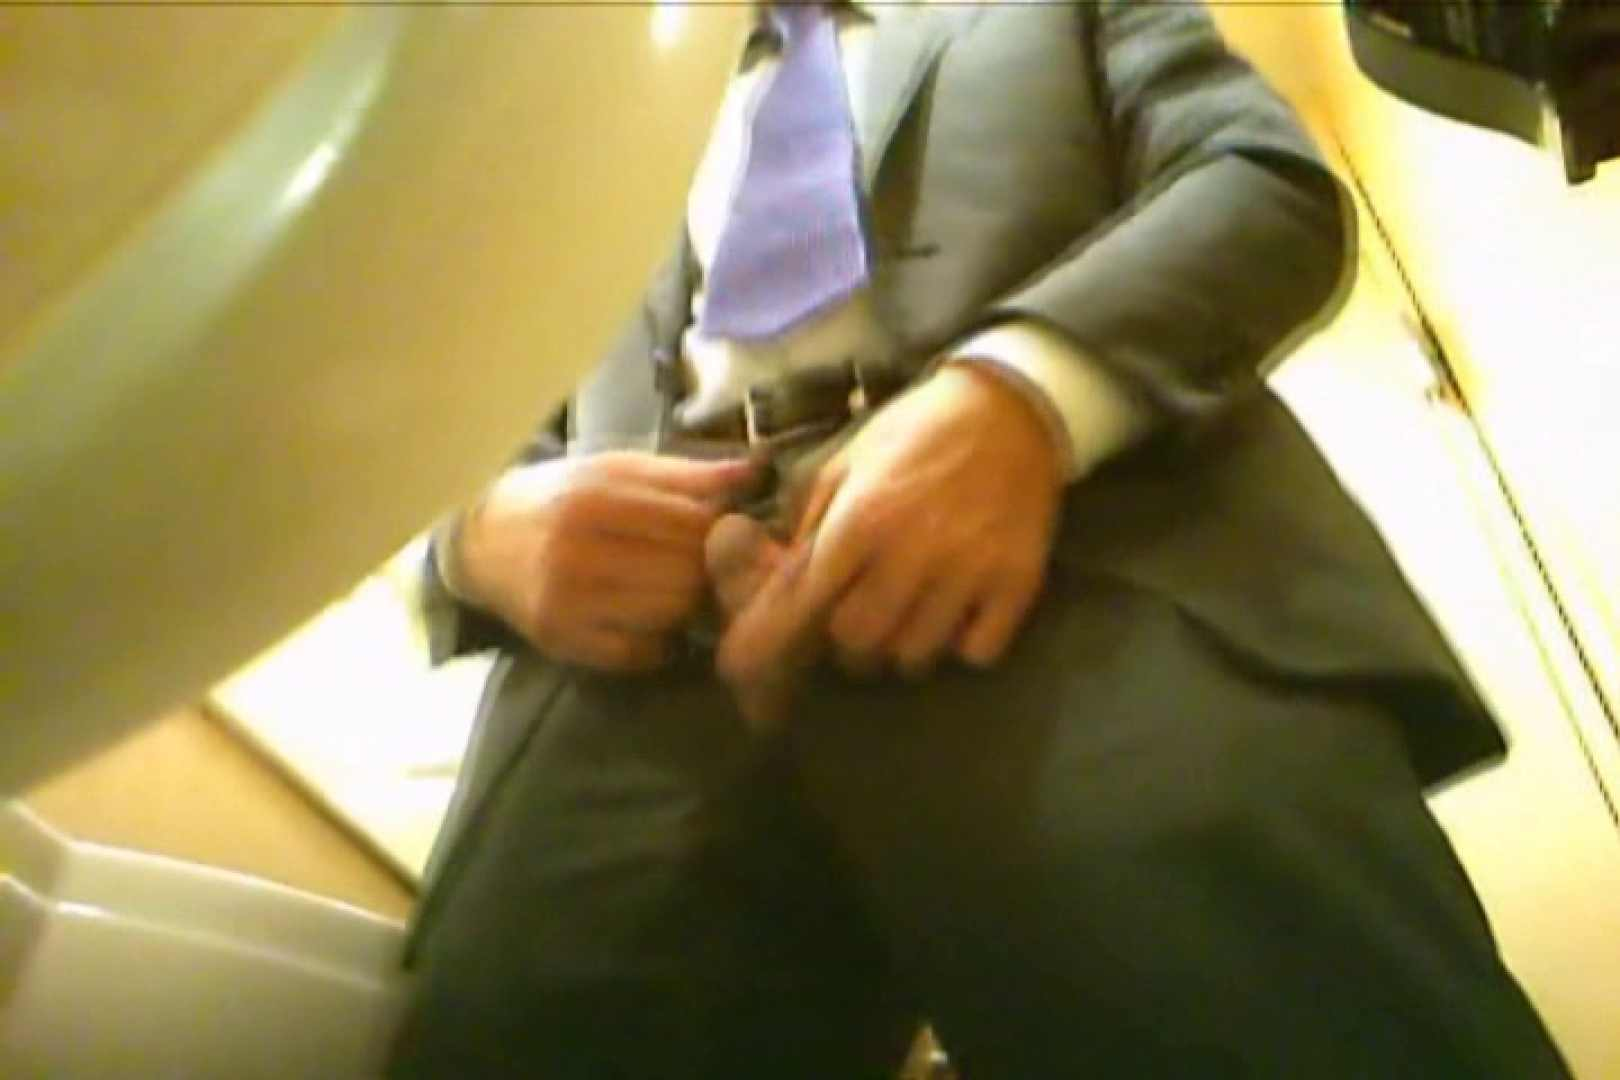 SEASON 2ND!掴み取りさんの洗面所覗き!in新幹線!VOL.06 スーツ男子 ちんぽ画像 87枚 29